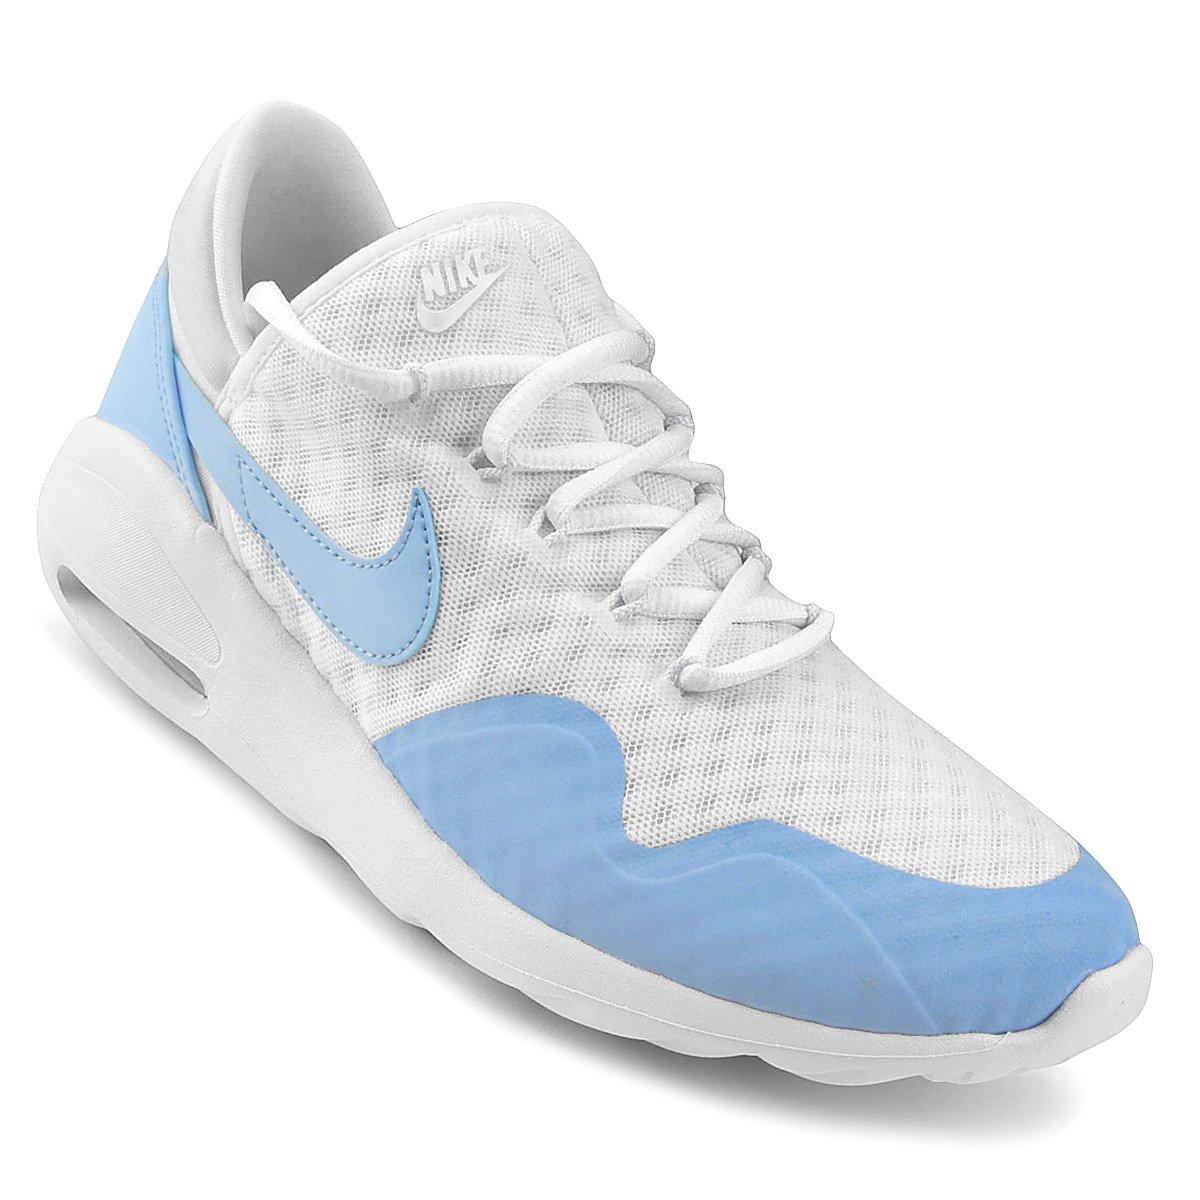 Neu Tênis Nike Air Max Sasha Feminino Branco e Preto Rabatt